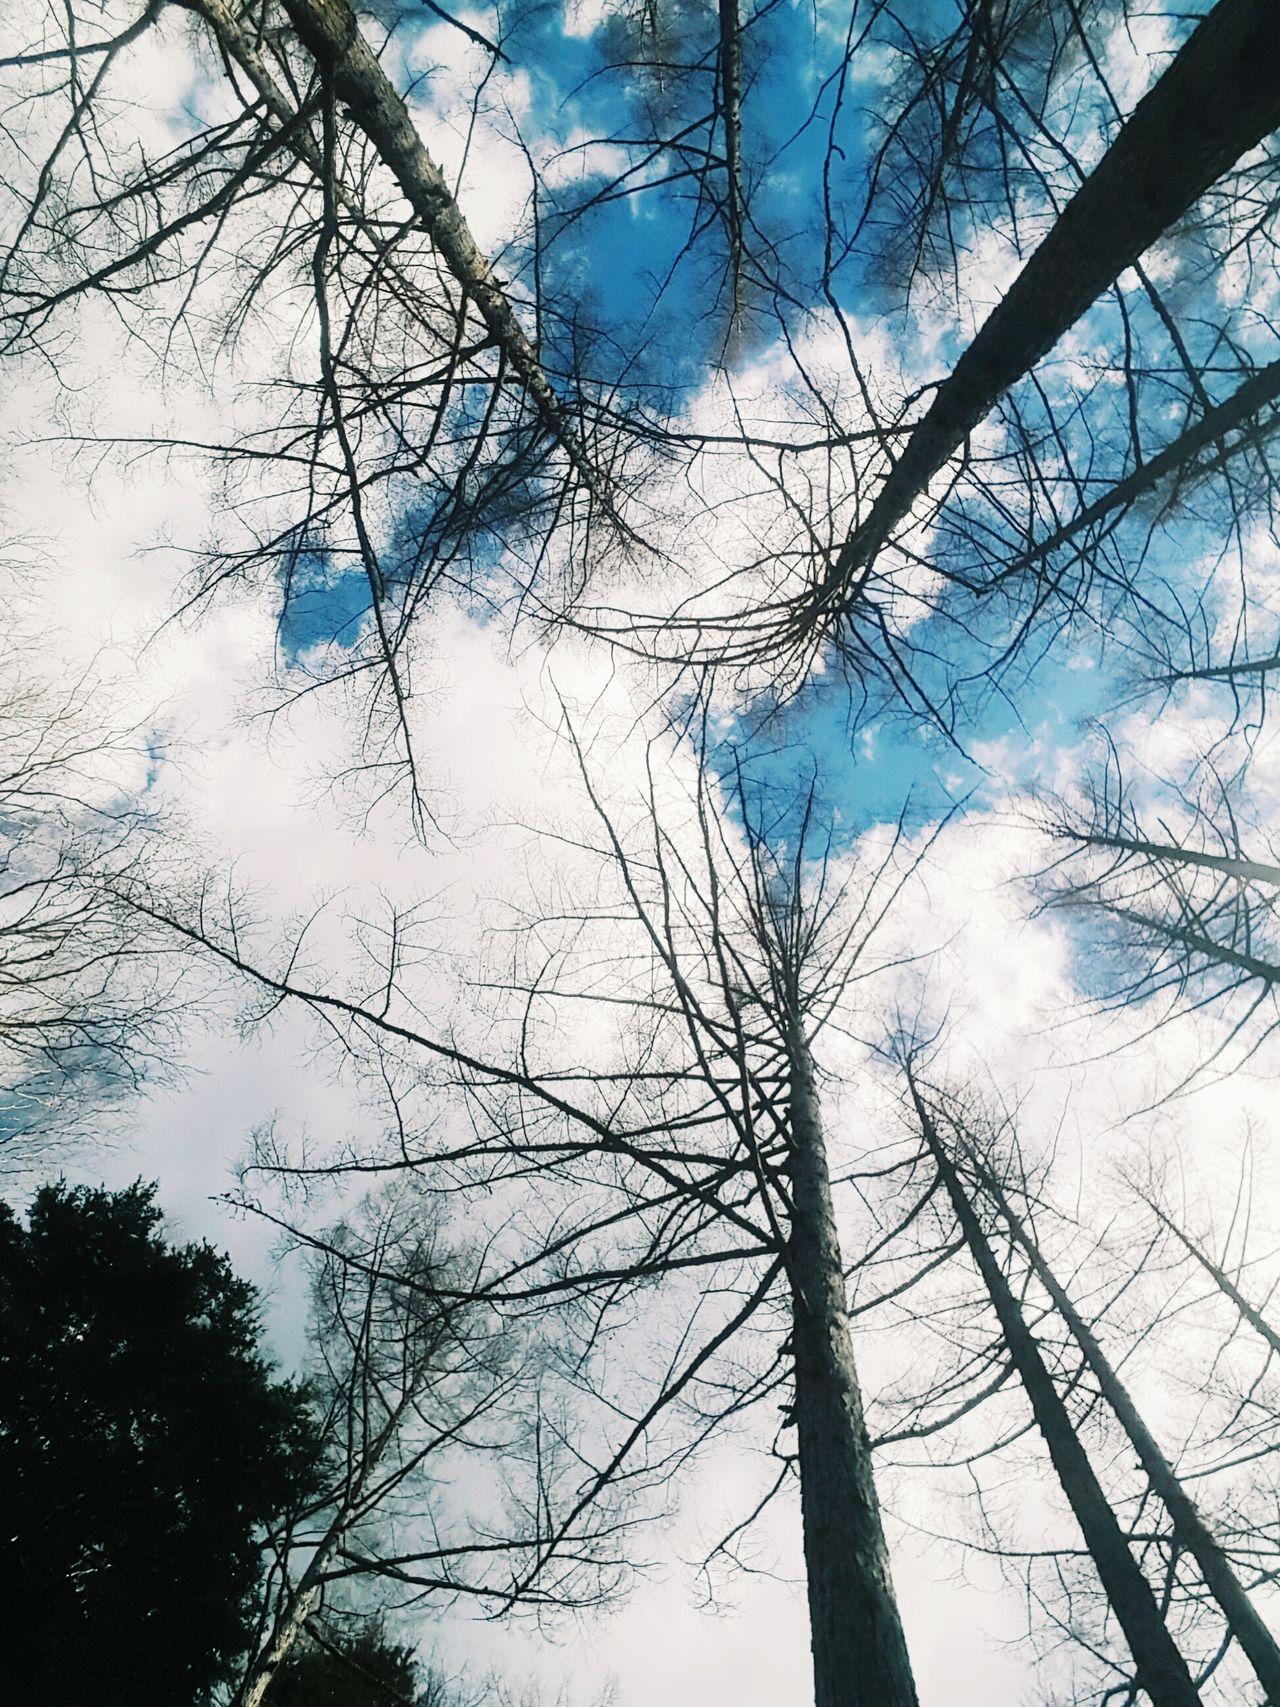 Japan 黑部立山 黑部峽谷 Japan Photography Tree Nature Sky Cloud - Sky First Eyeem Photo